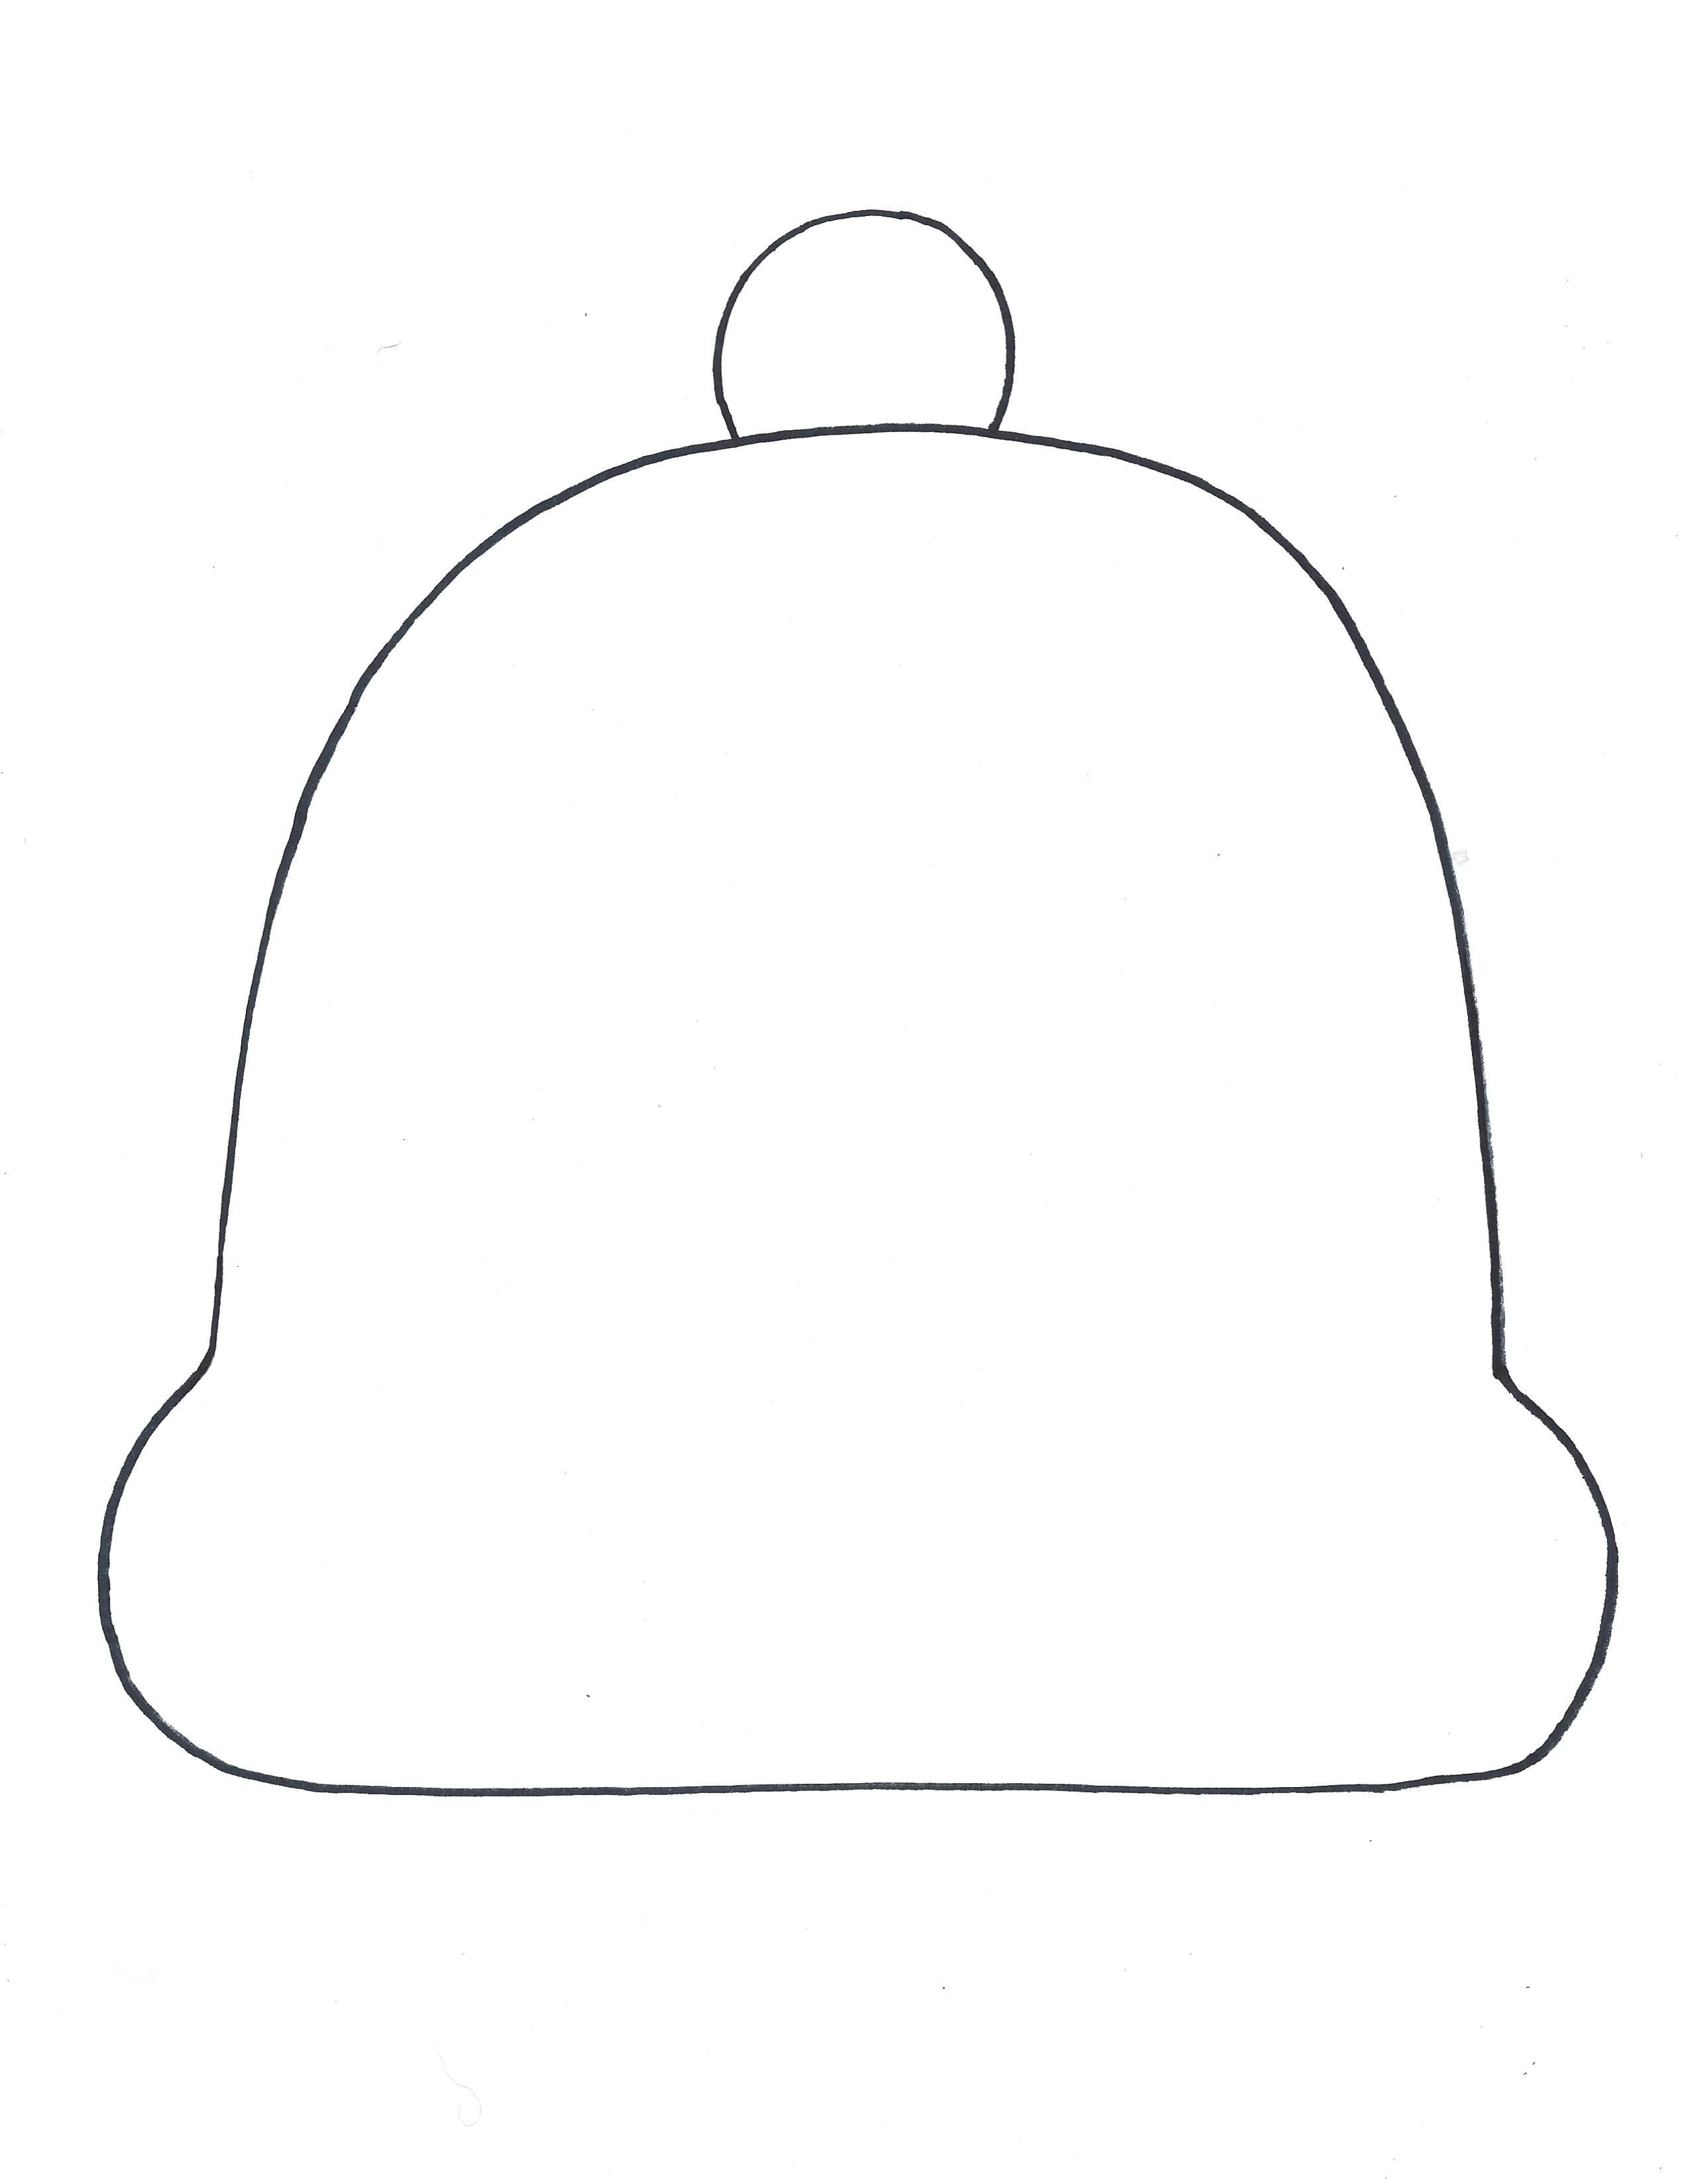 Pilgrim hat templates eliolera p is for pilgrim hat coloring page twisty noodle pronofoot35fo Choice Image